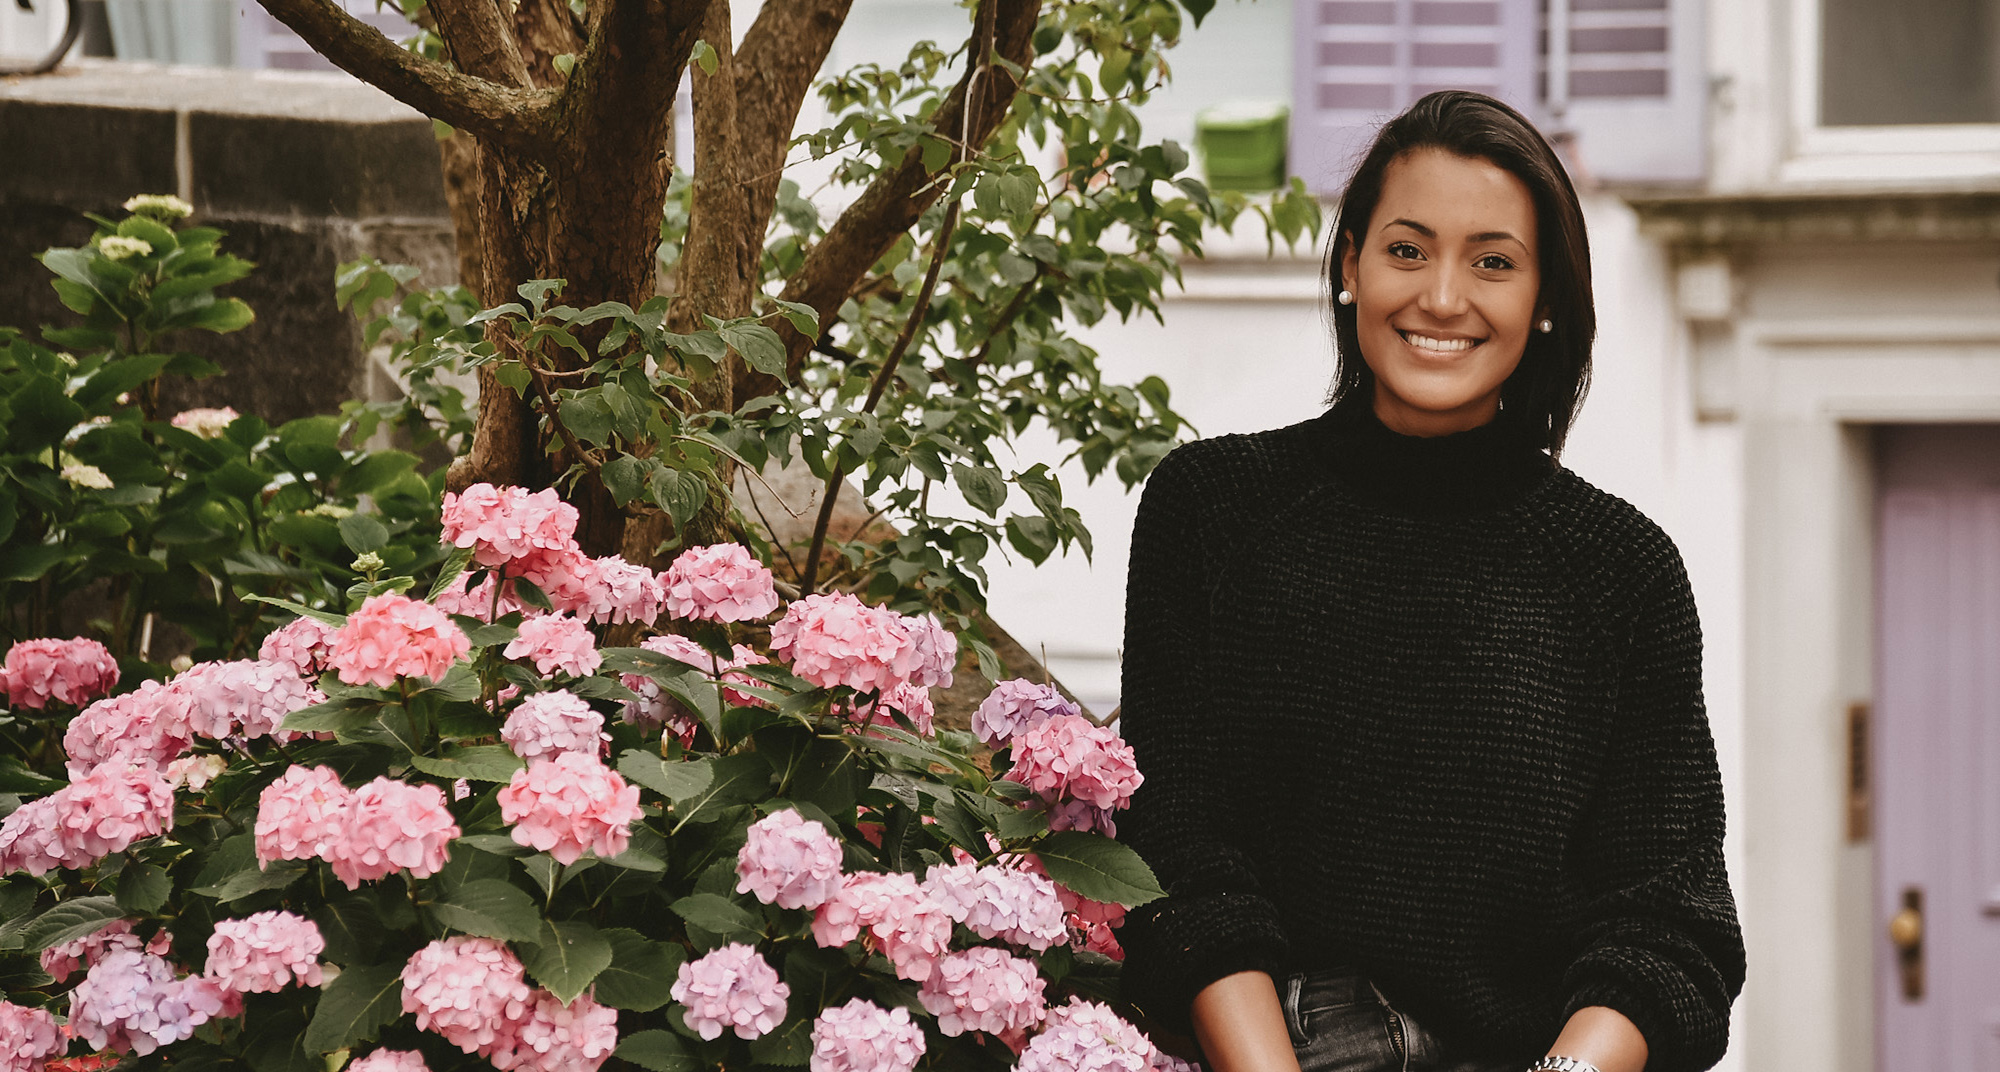 Ursula Studentin Bachelor Sprachliche Integration